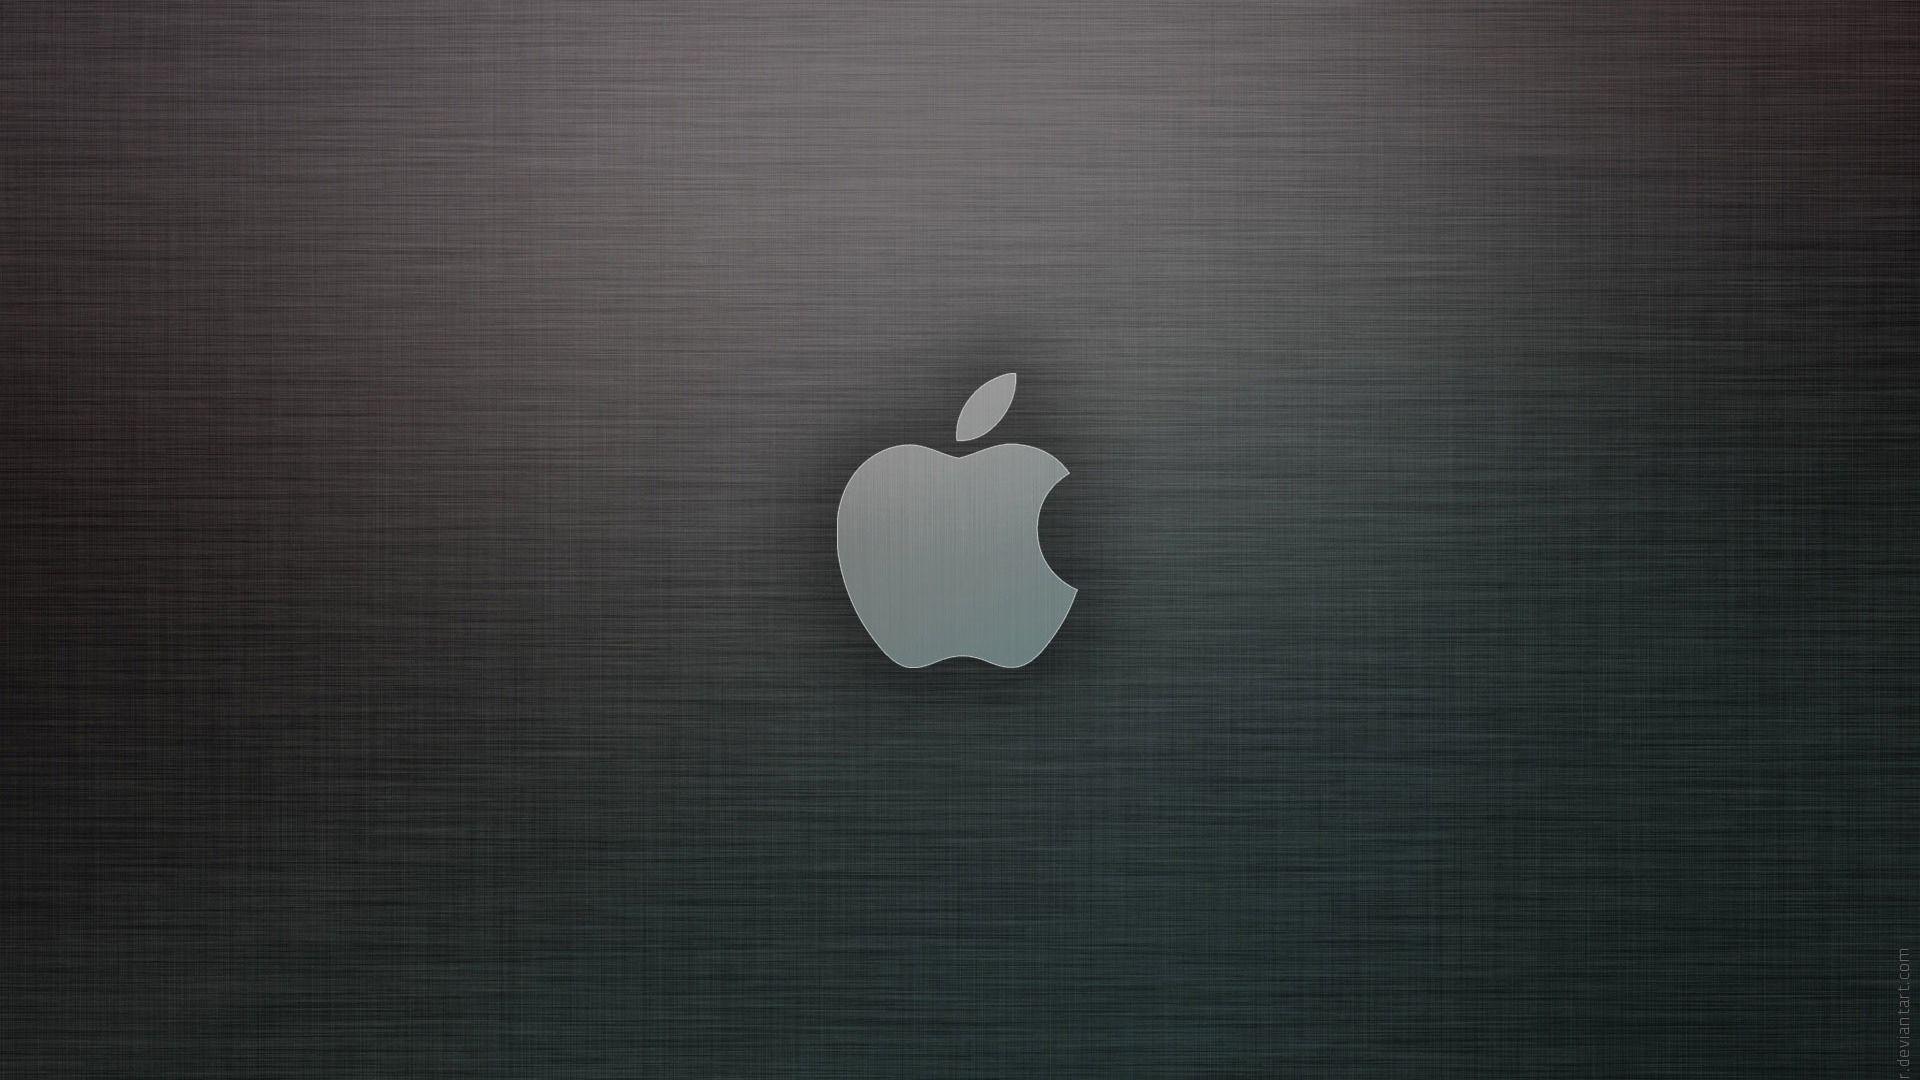 Apple Ipad wallpaper for pc